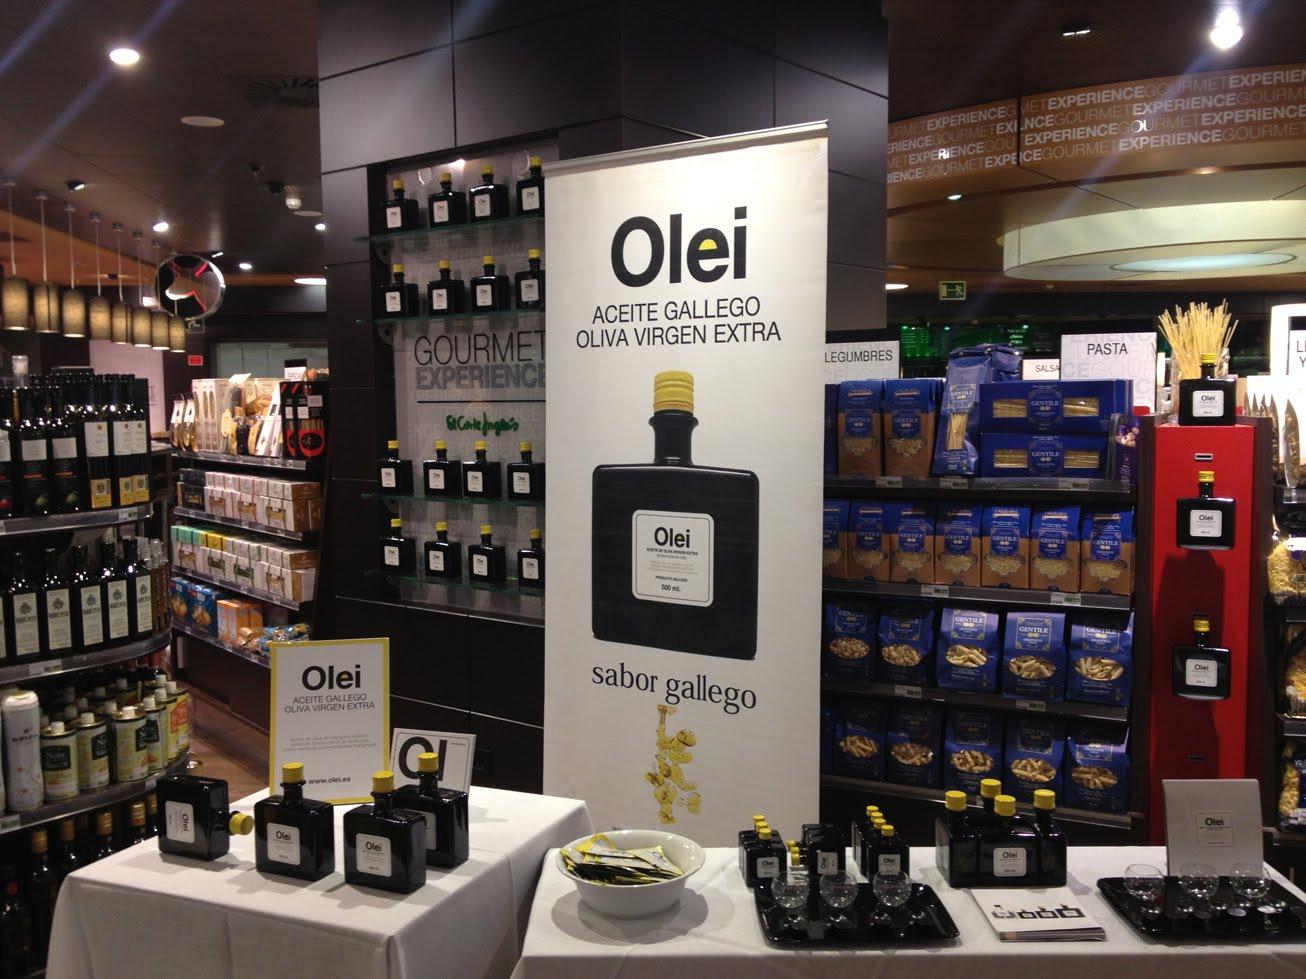 Club del sommelier olei en el galicia s excellent - Gourmet experience goya ...